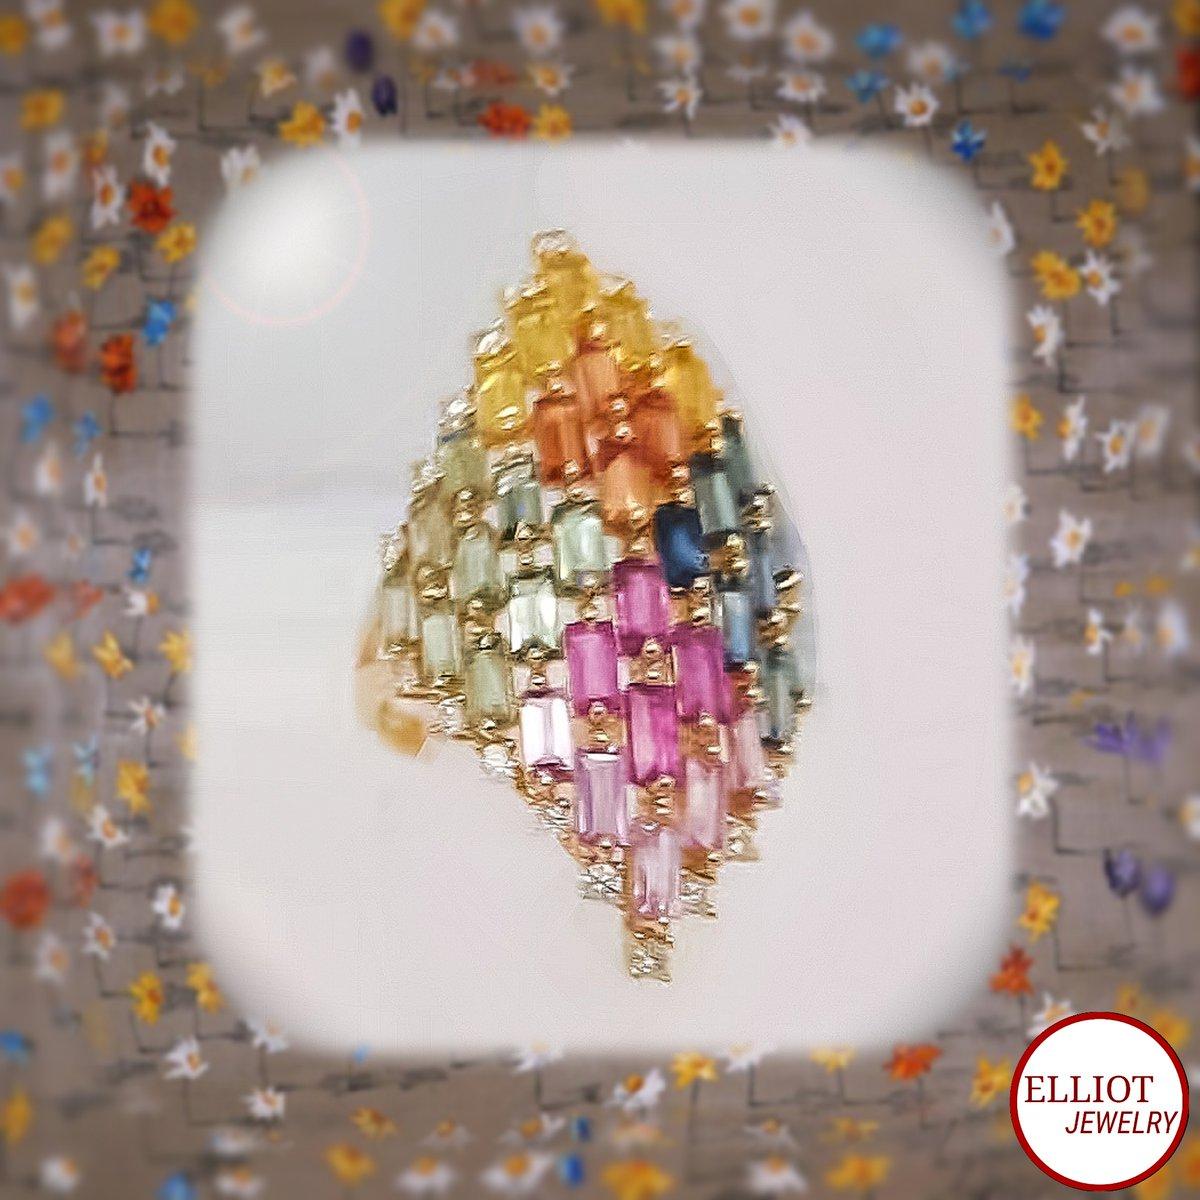 Fine Jewelry Elegance Design & Excellence Craftsmanship  ------ http://ElliotJewelry.net ------ #Jewellery #trendy #designer #moda #fashion #hautejoaillerie #Highjewellery #бриллианты #bijoux #Luxury #ElliotJewelry #handmade #shoponline   #ピアス #ジュエリー #ファッション #هداياpic.twitter.com/QdxdYiNNnz